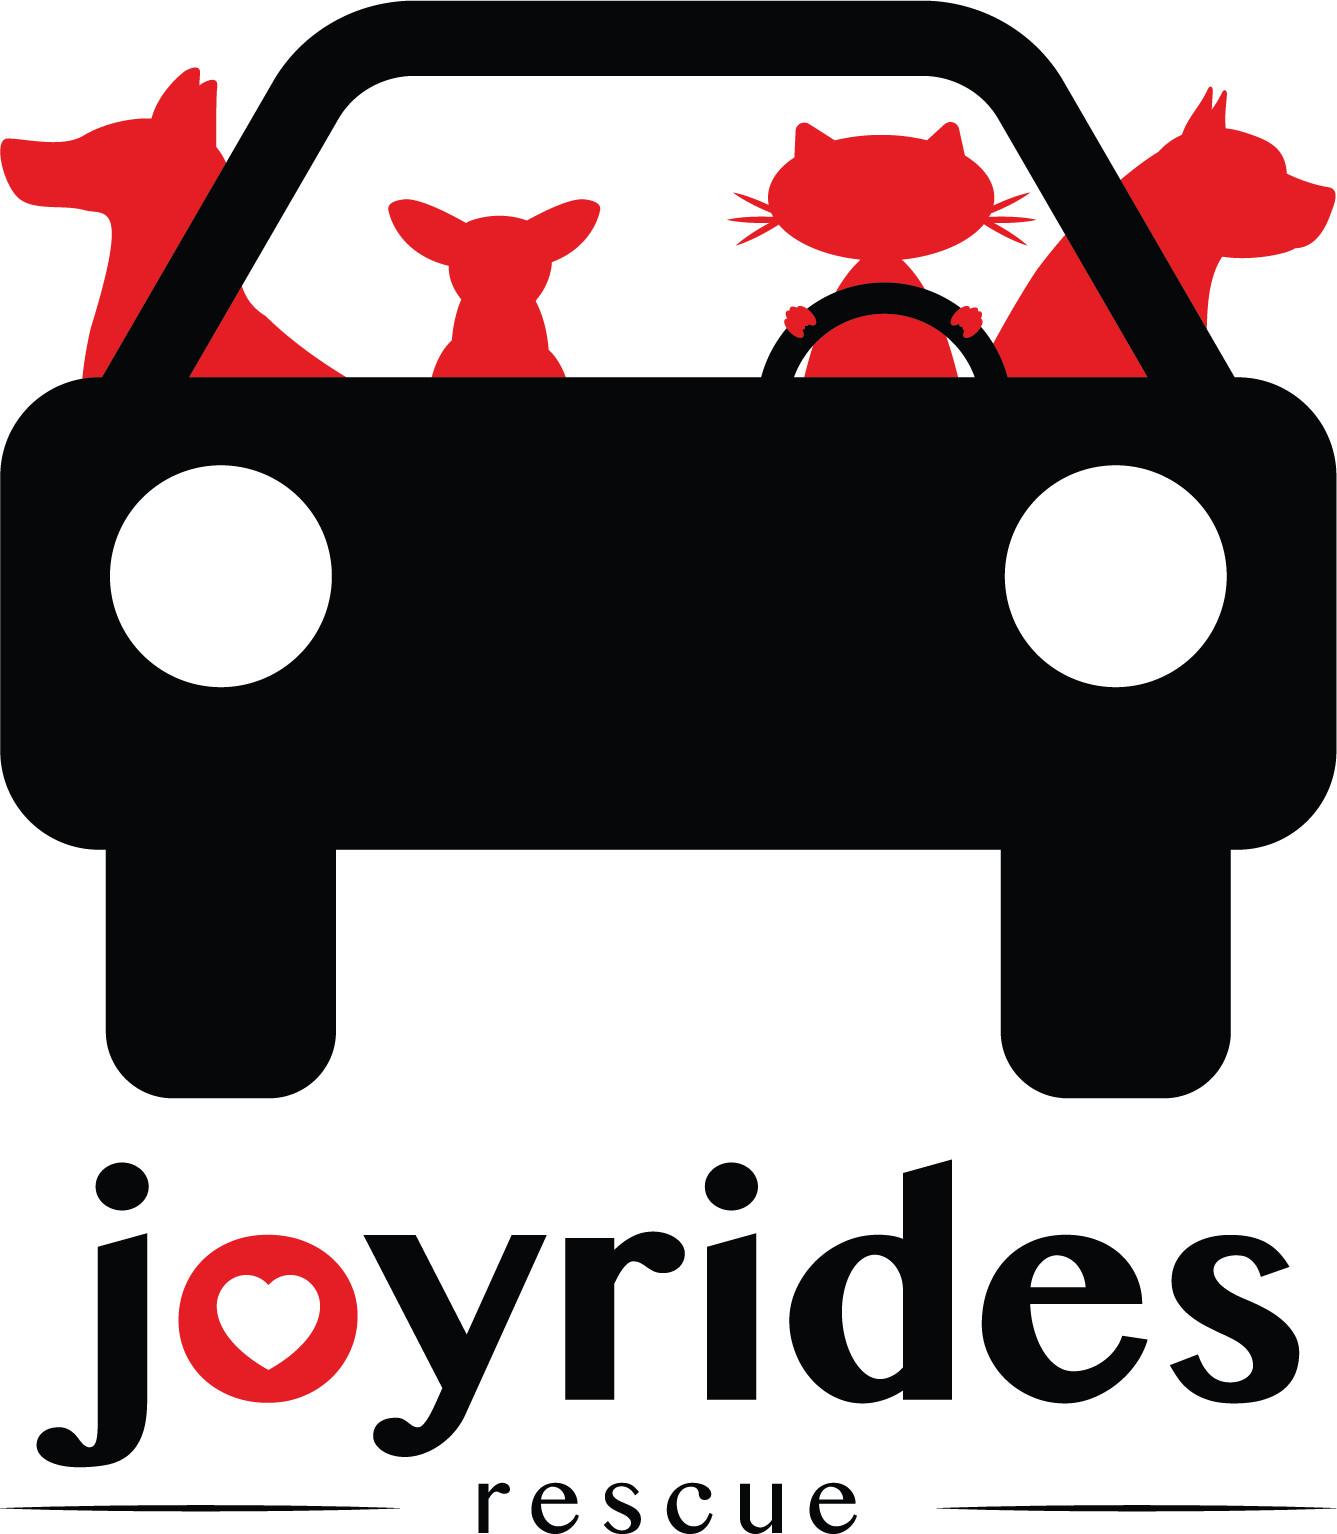 Joyrides Rescue